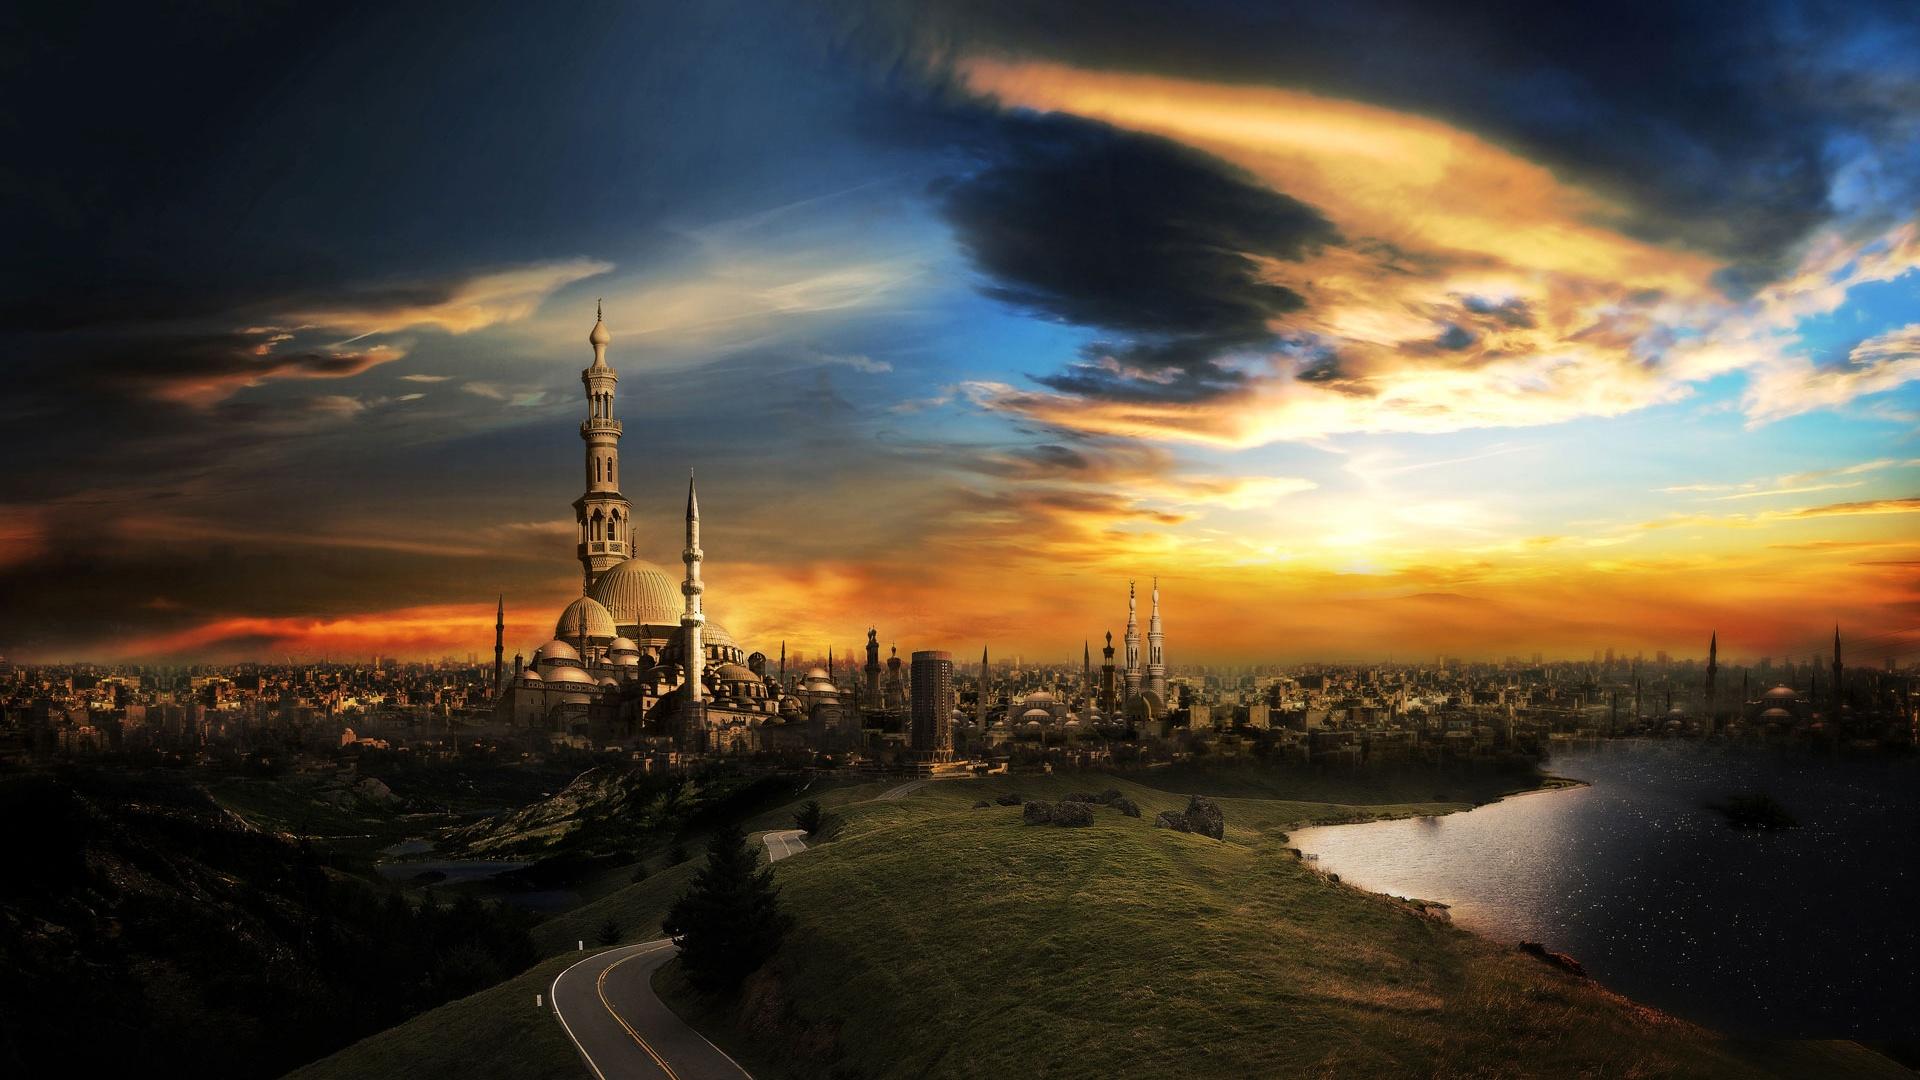 Islamic-City-Wallpaper-webstudy.pk